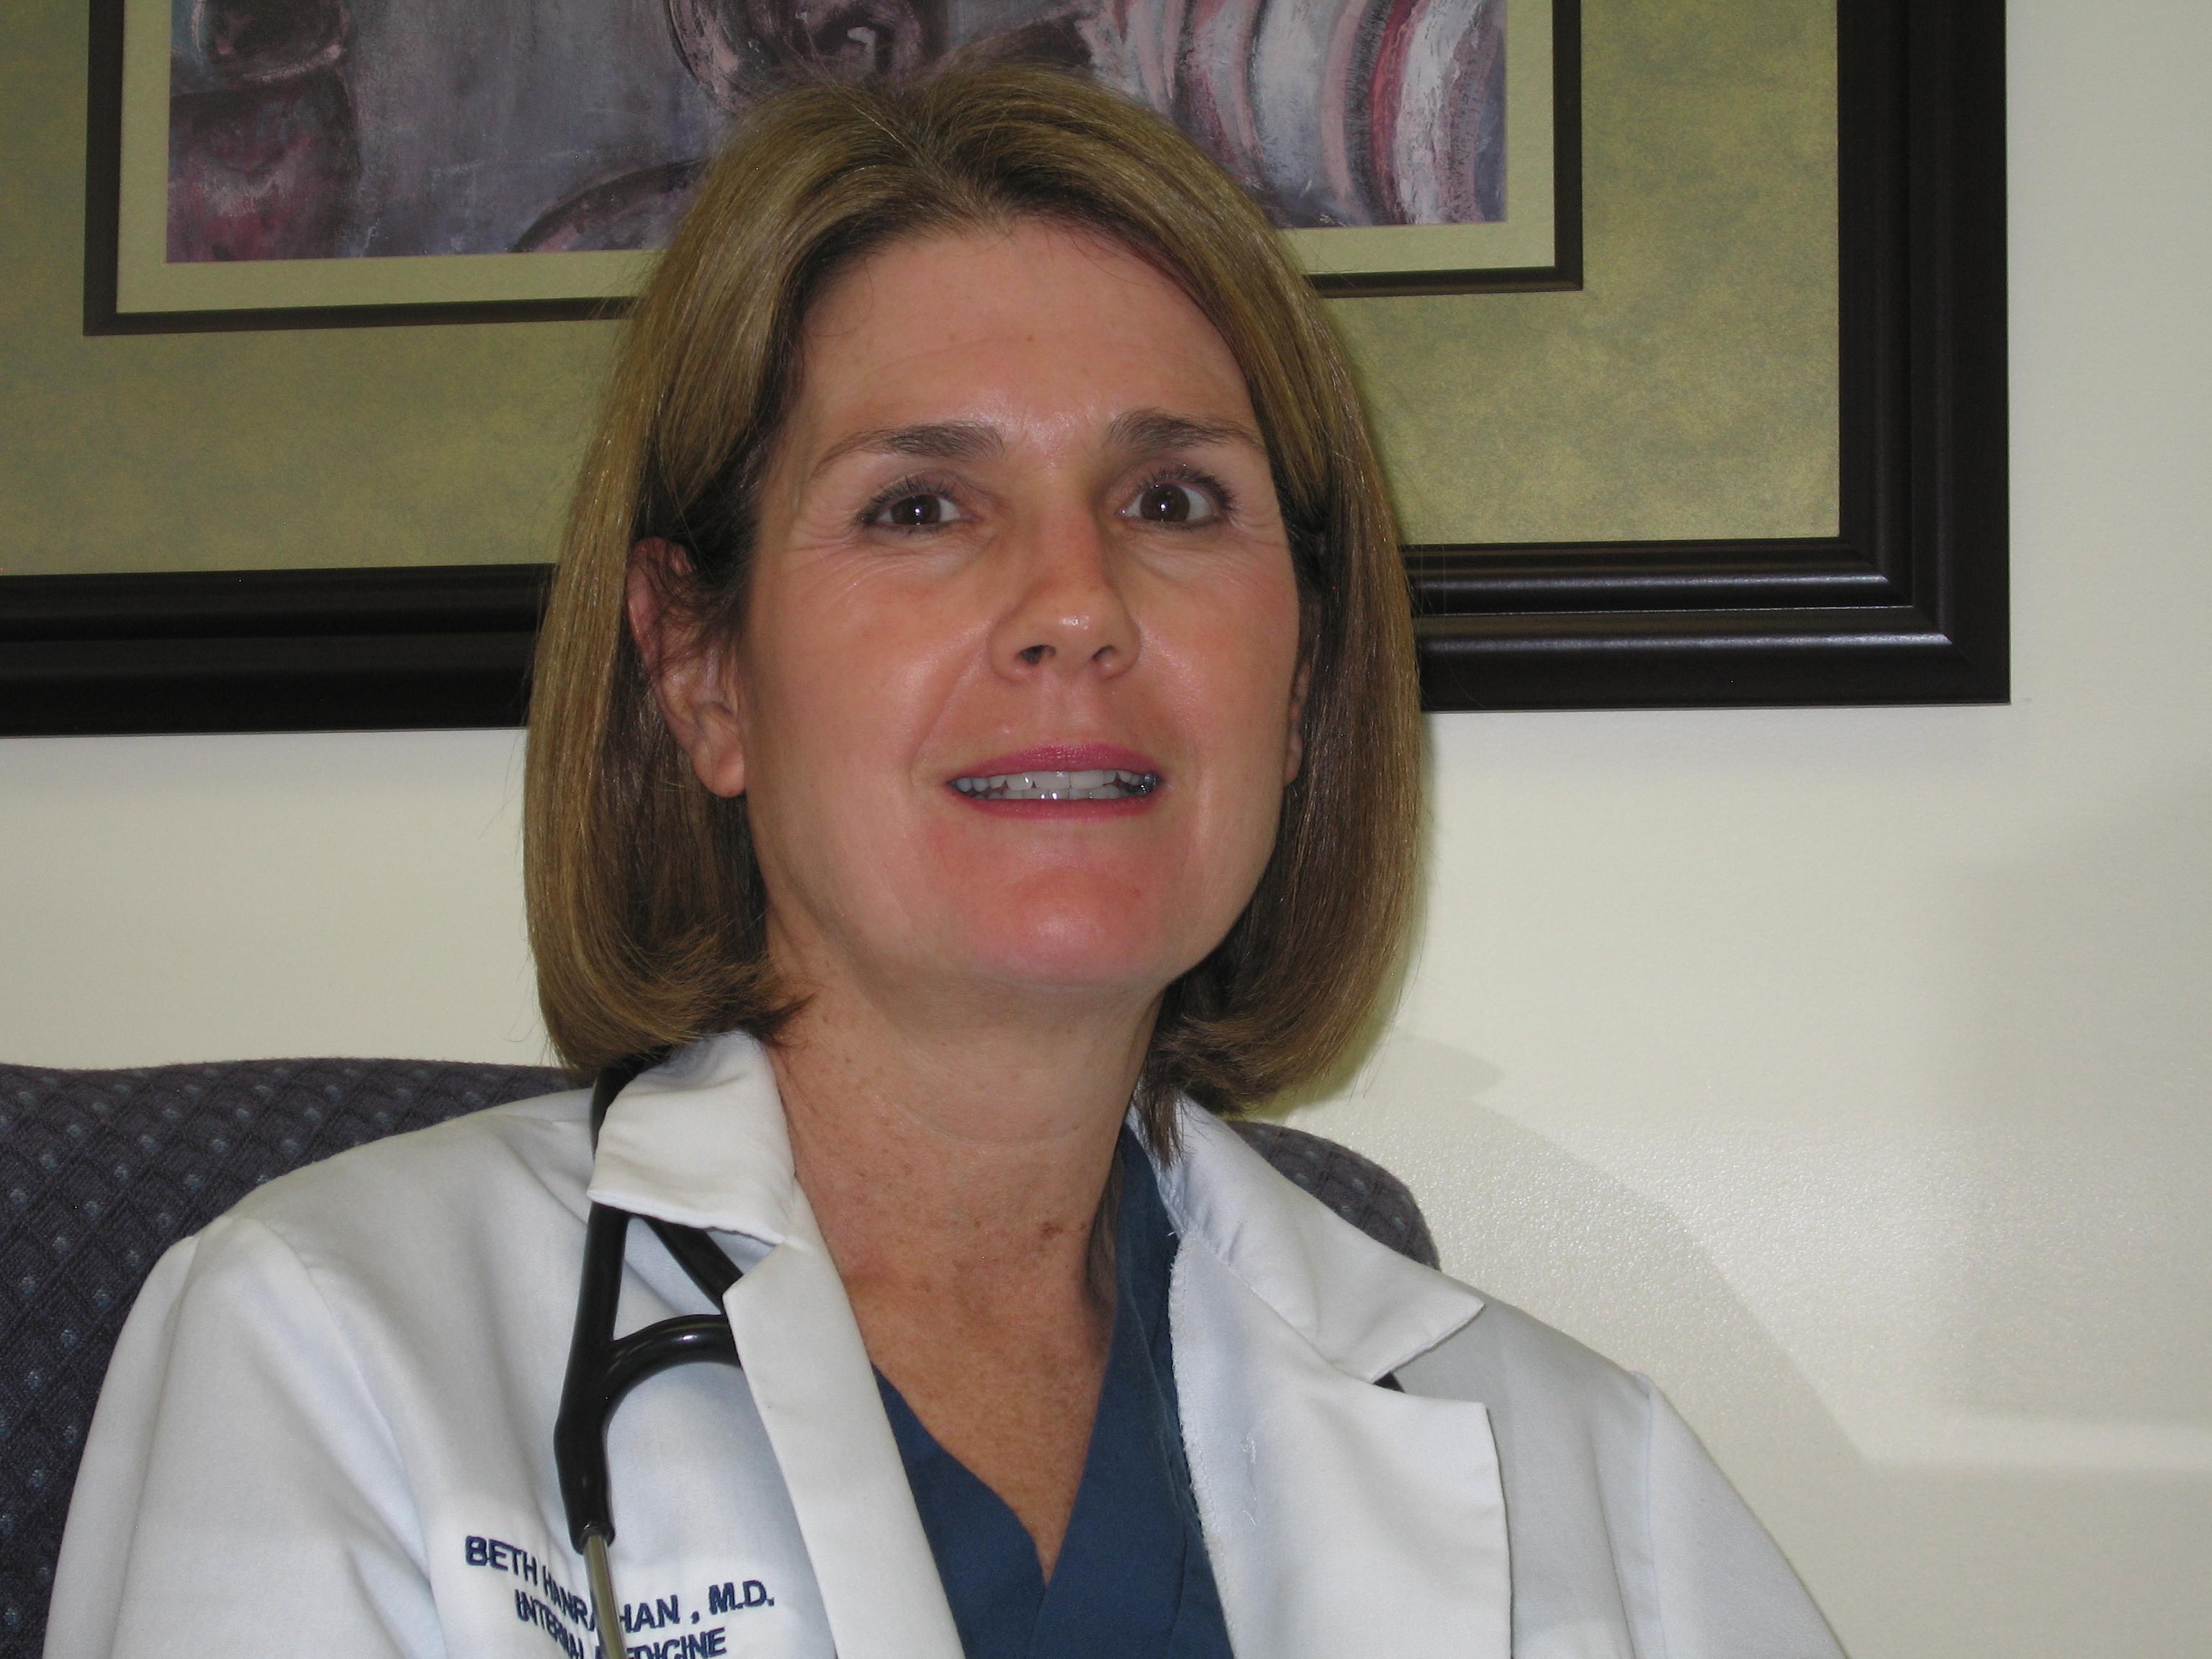 Beth Hanrahan, MD, LLC